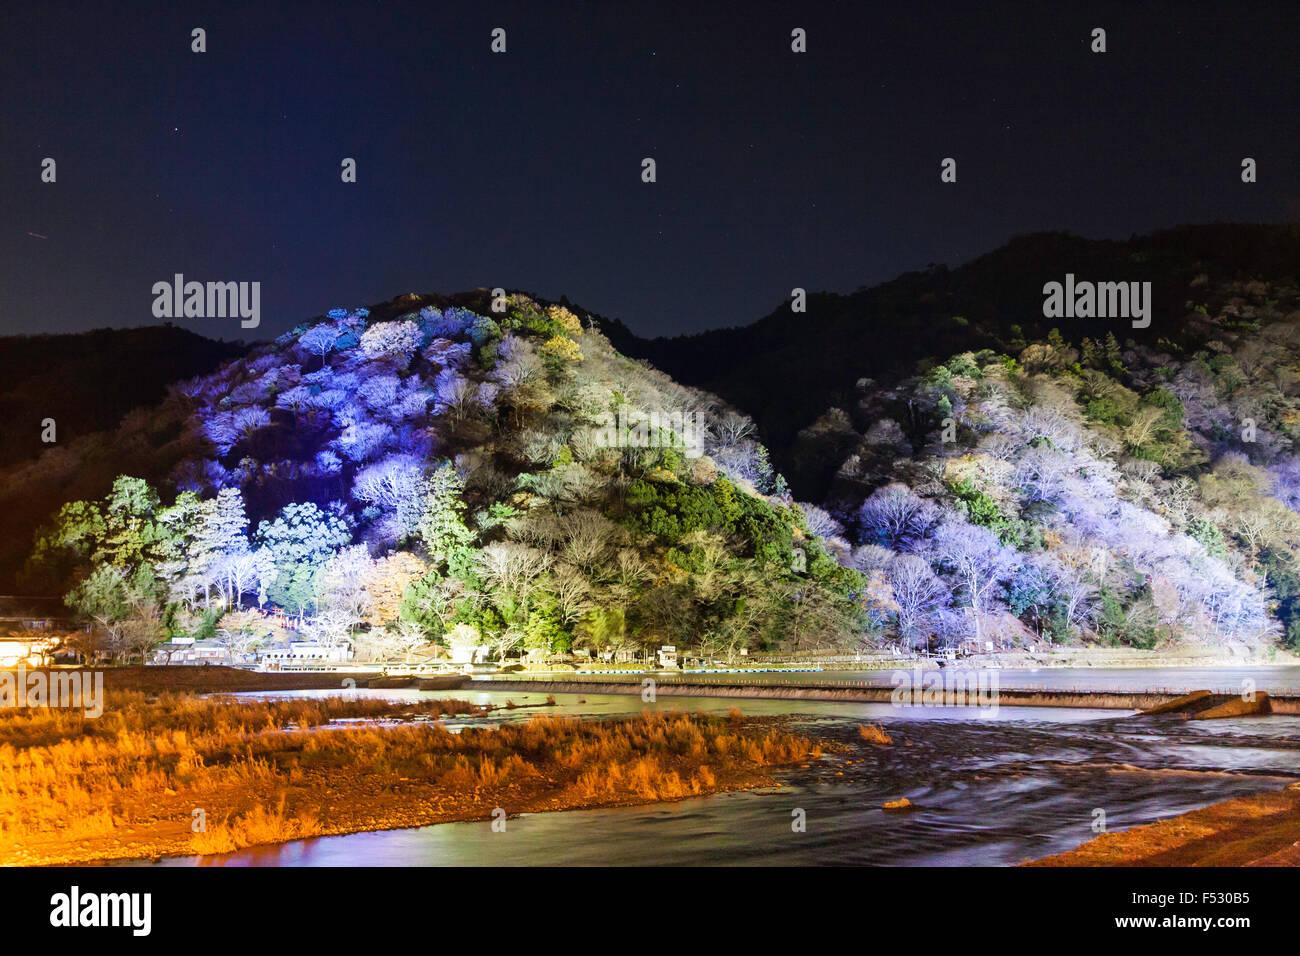 Japan, Kyoto, Arashiyama. Hanatouro light festival. Night-time. View across Hozu River to tree covered mountain - Stock Image